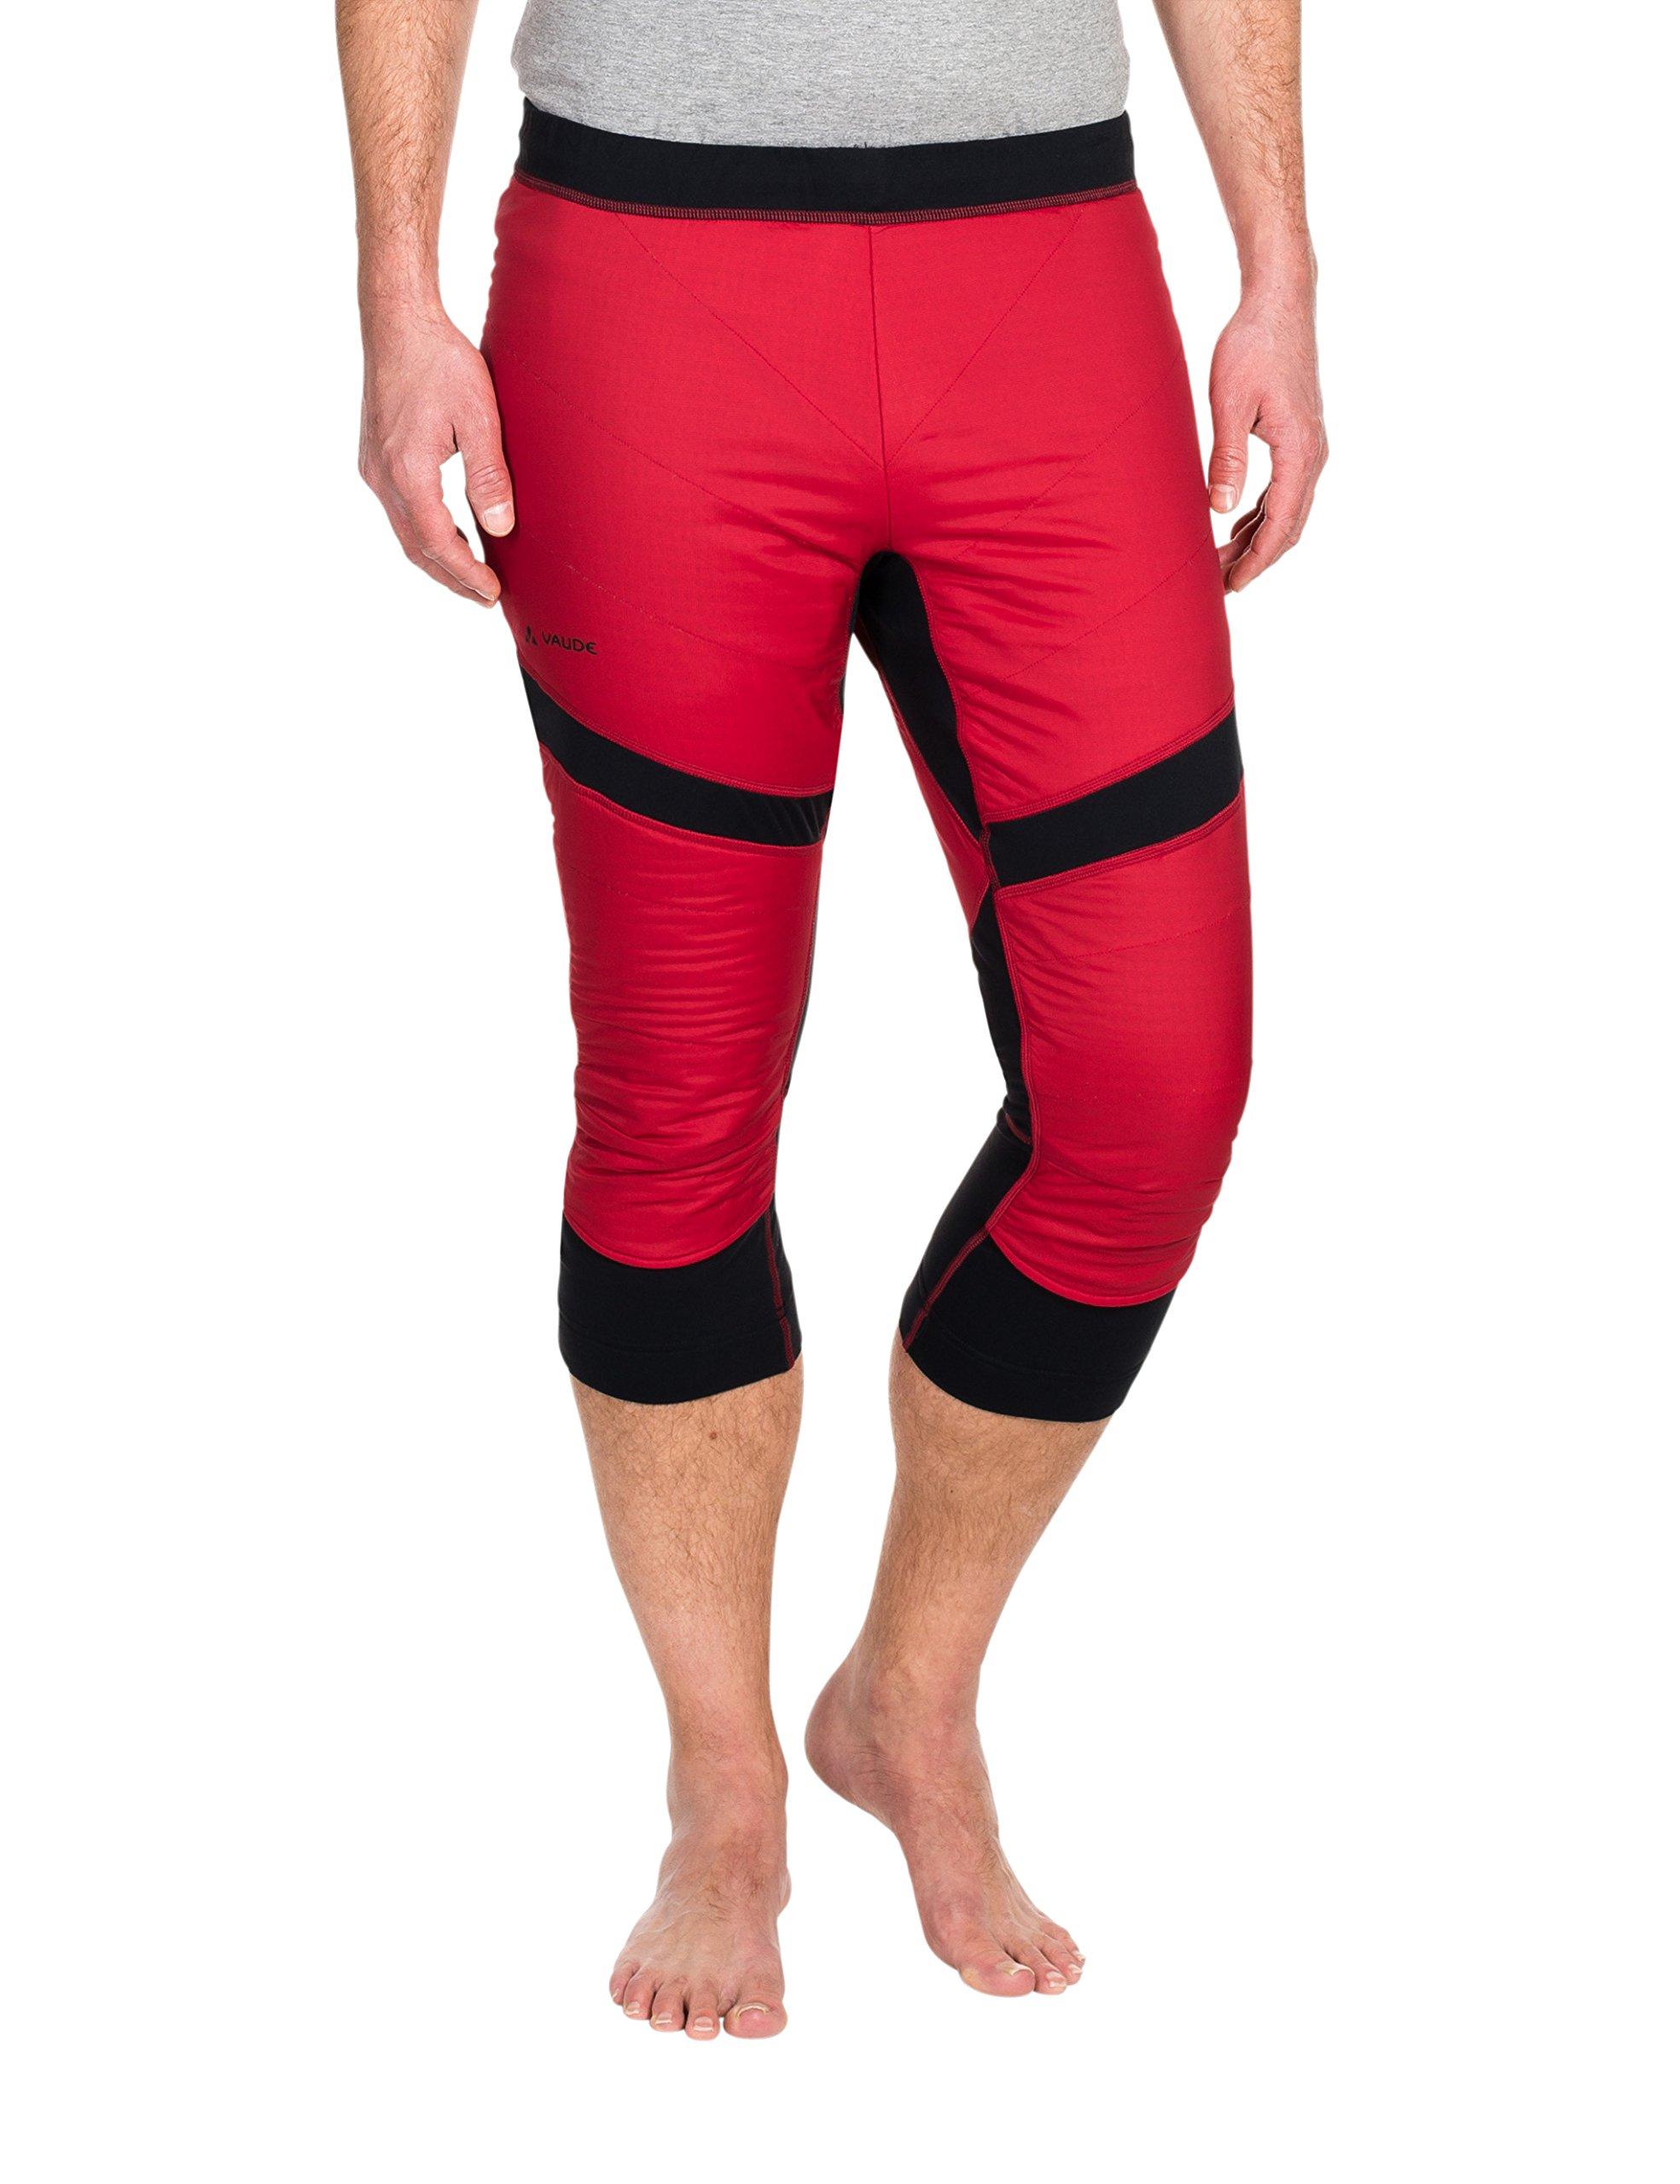 VAUDE Boe Warm Pants–Pantaloni, Uomo, Hose Boe Warm Pants, Rosso indiano, XS